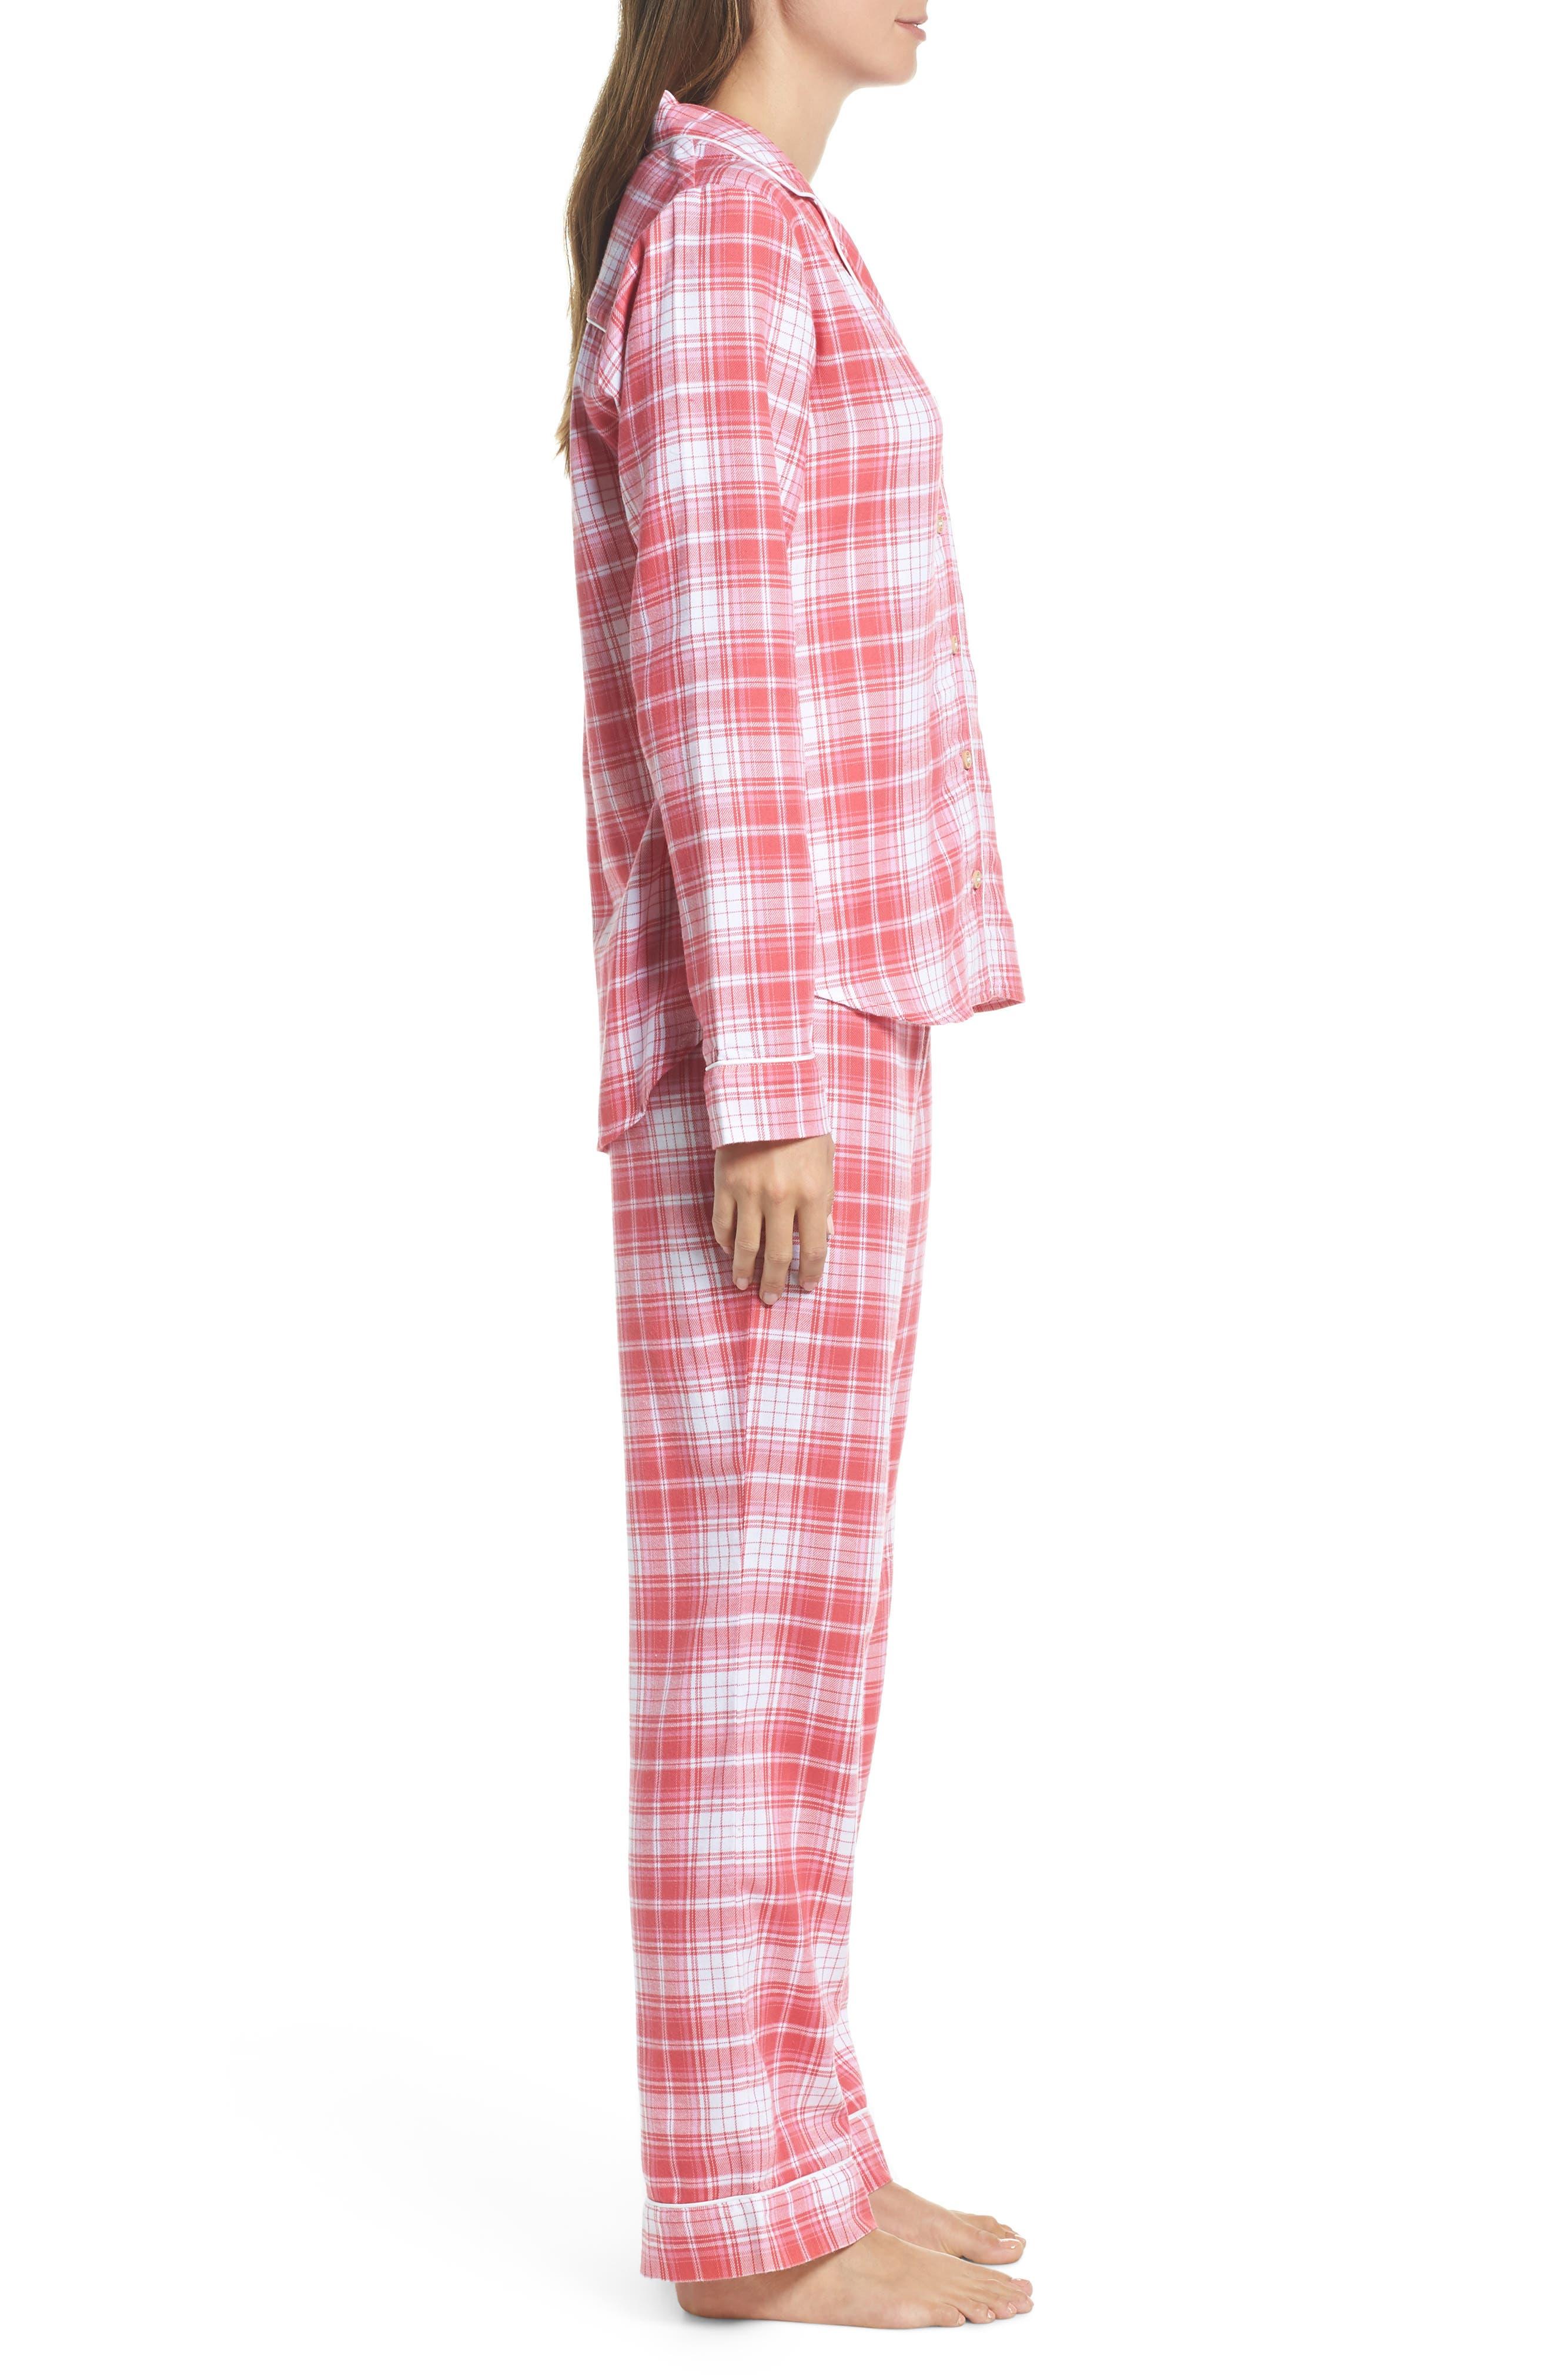 Raven Plaid Pajamas,                             Alternate thumbnail 3, color,                             CLARET RED PLAID